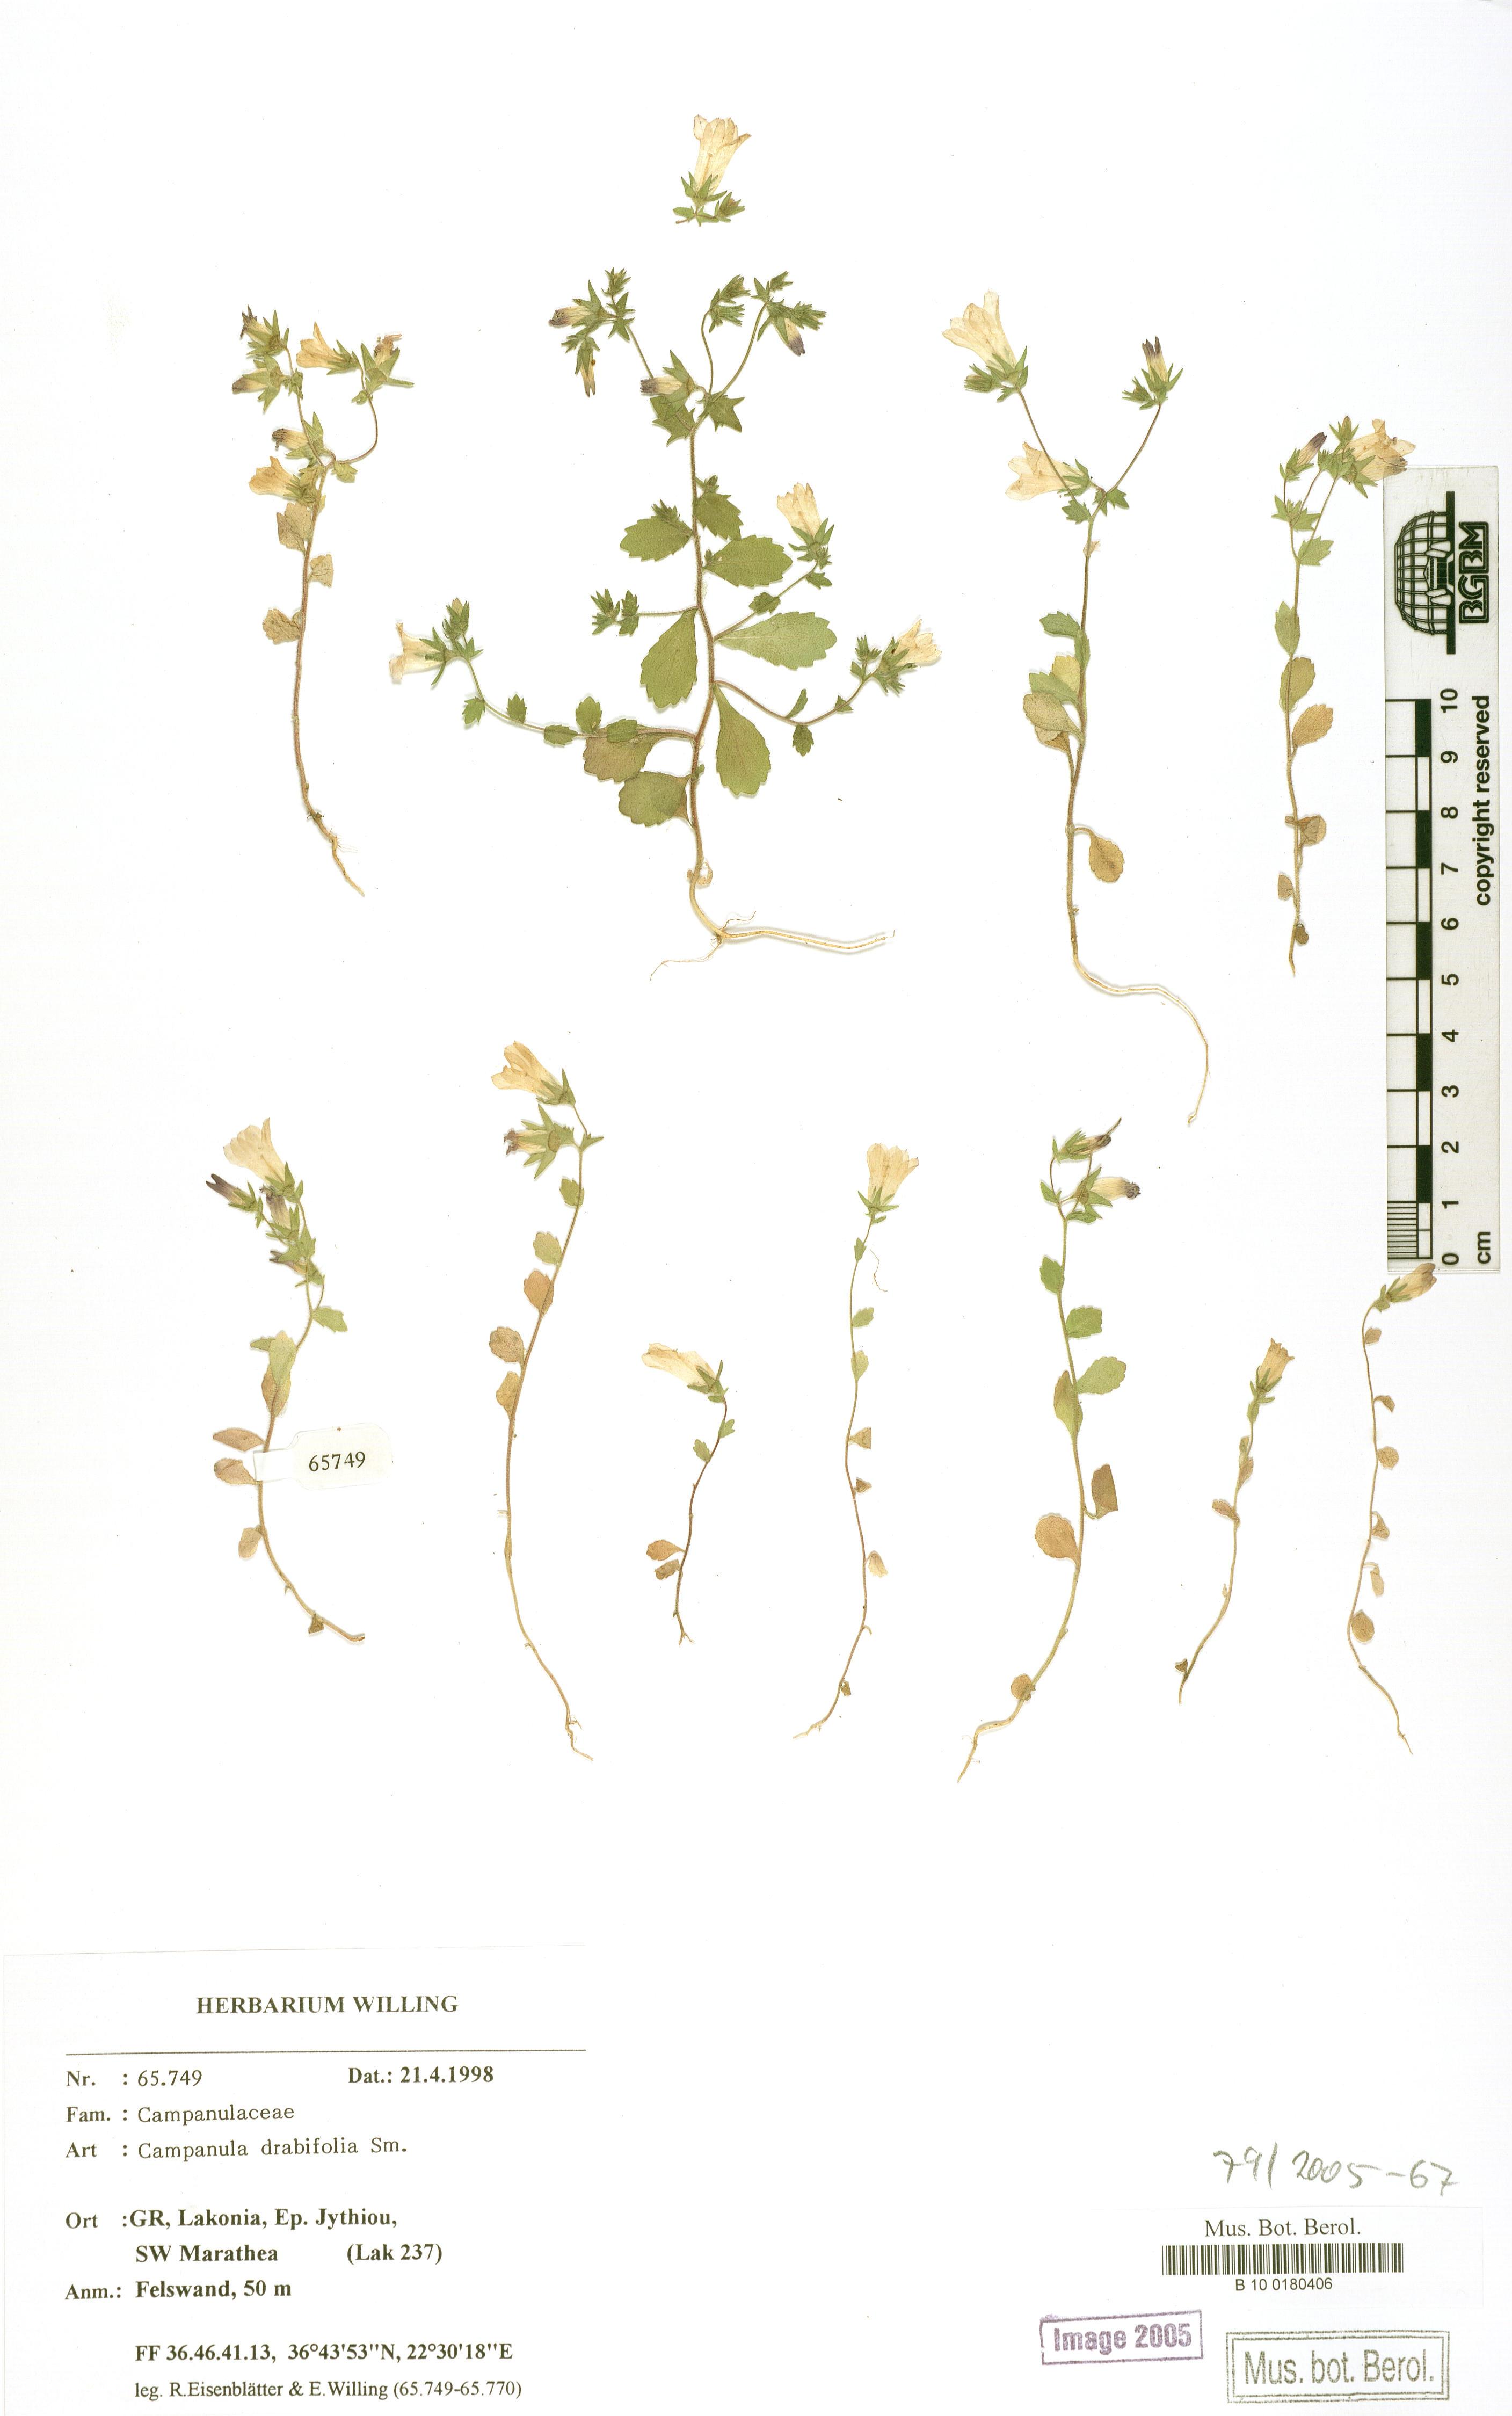 http://ww2.bgbm.org/herbarium/images/B/10/01/80/40/B_10_0180406.jpg